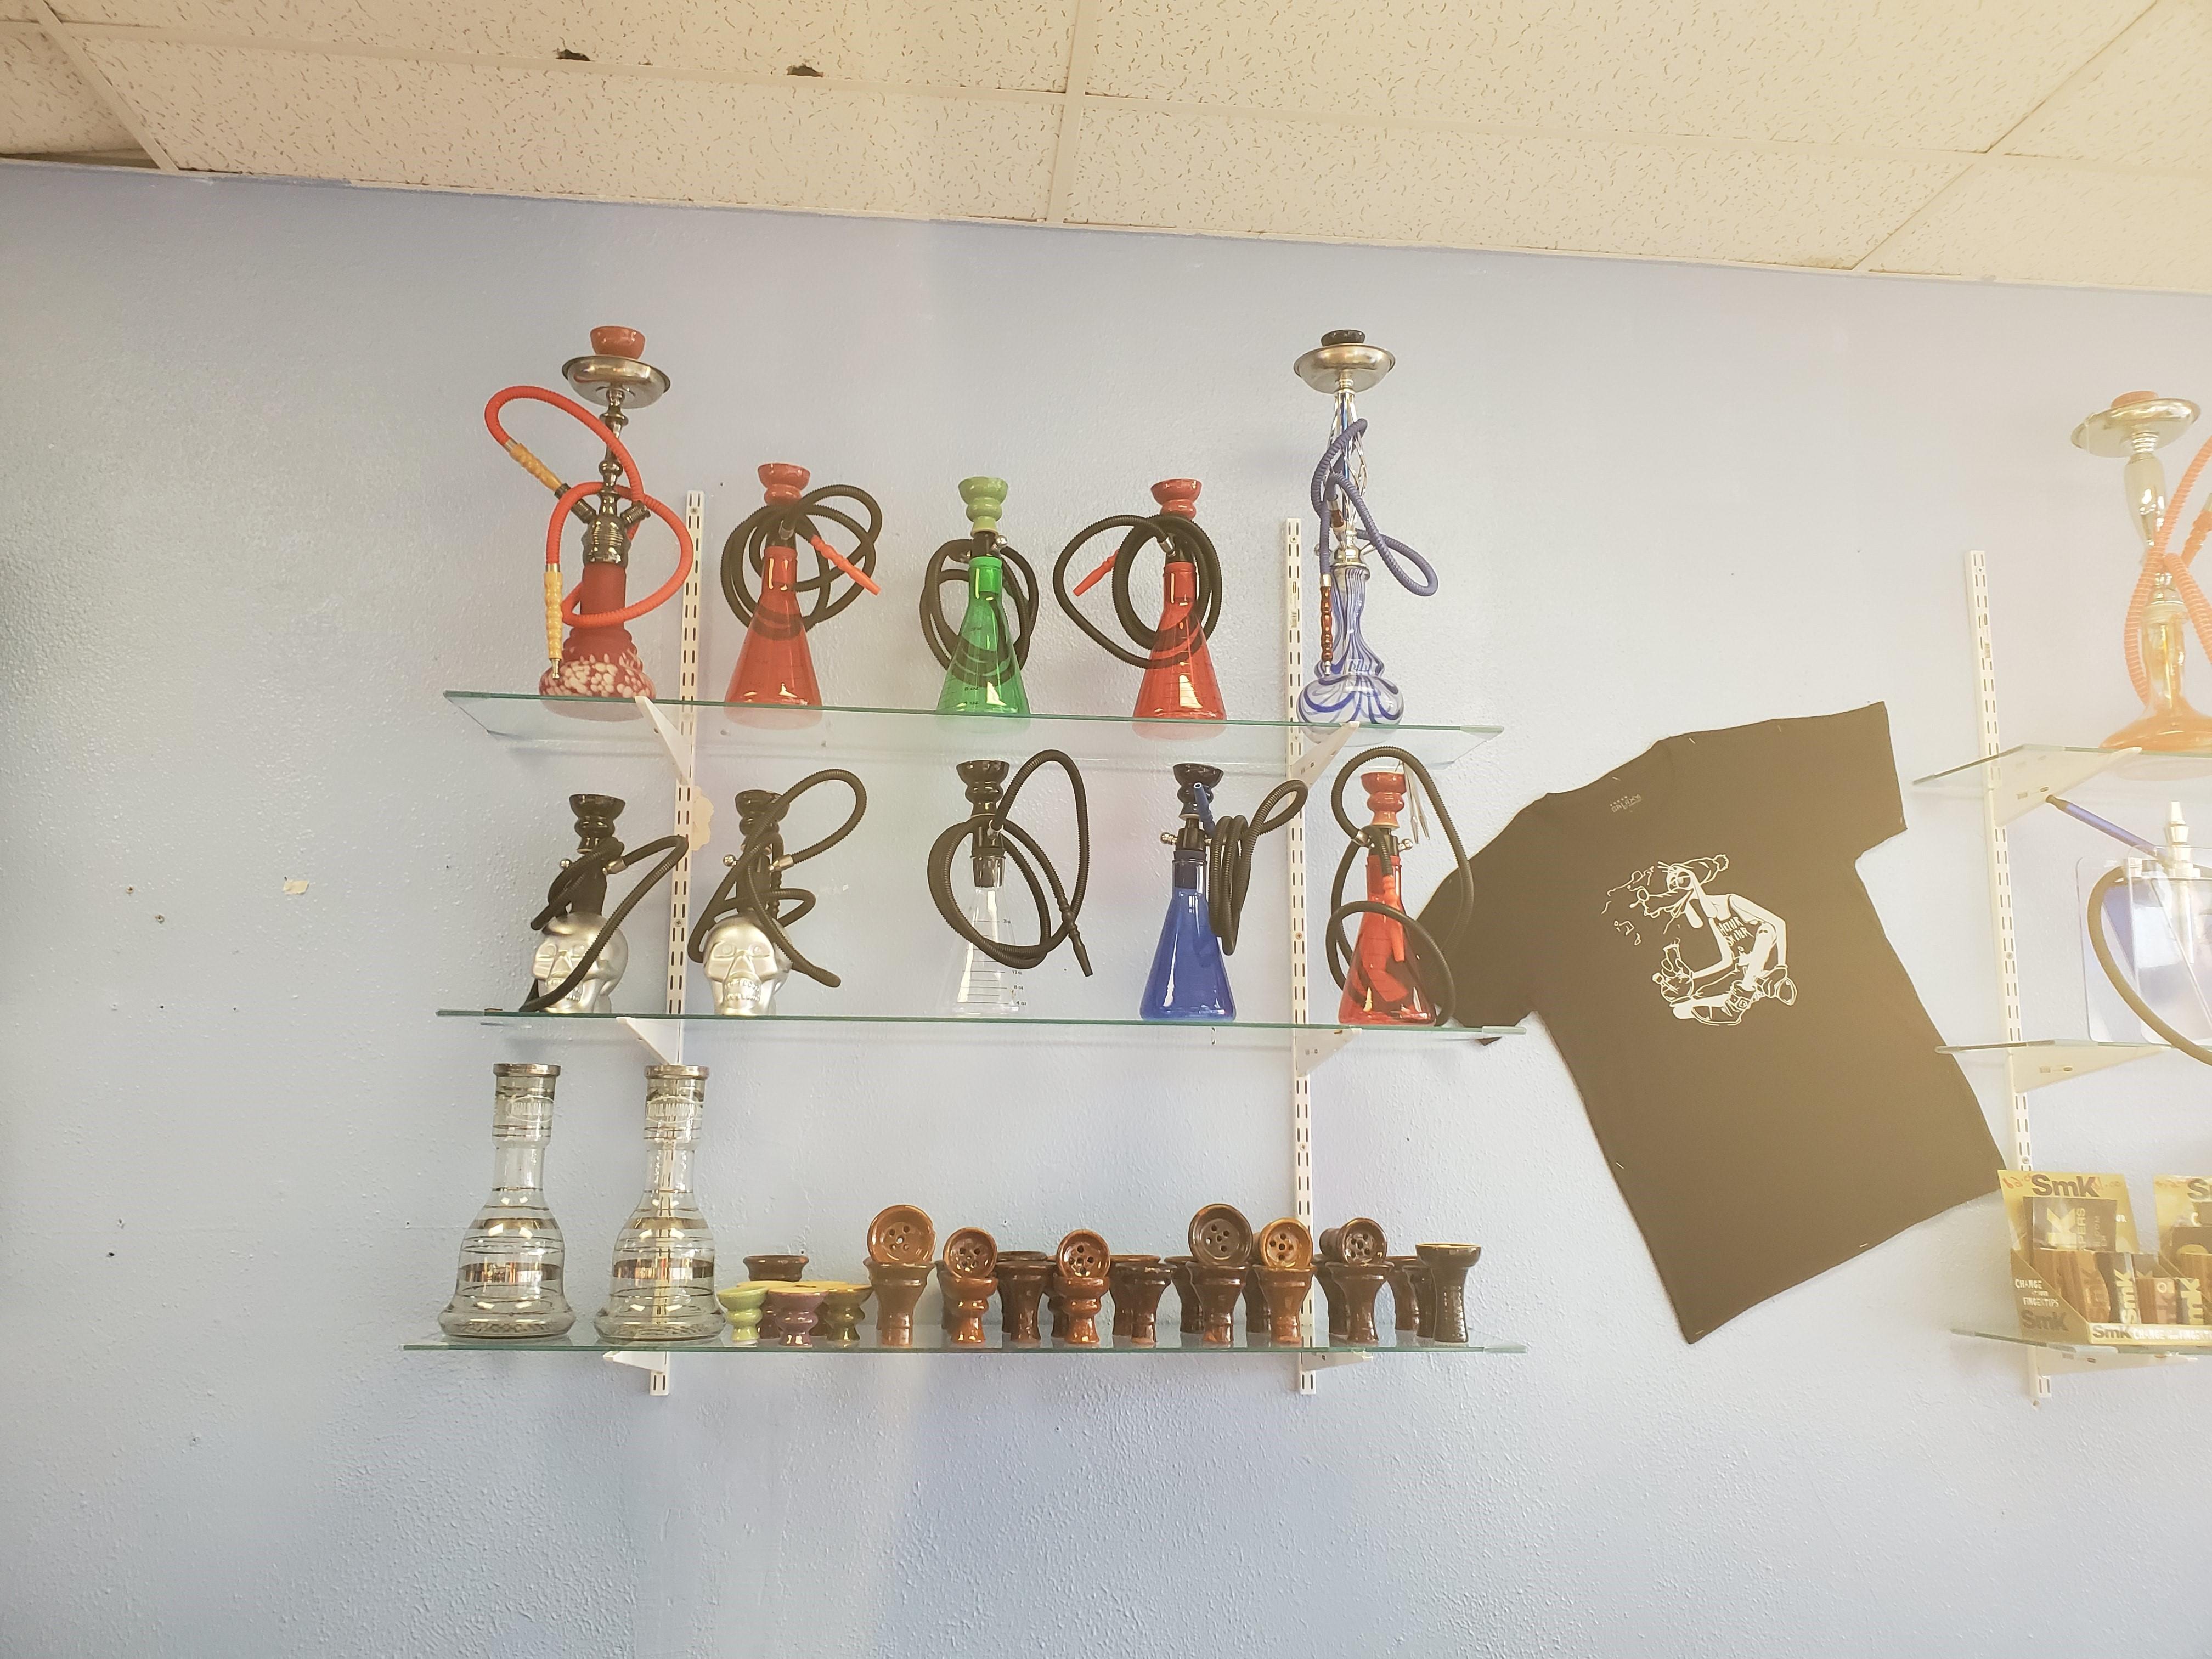 AJ's Phone Care - Smoke & Vape Shop Carol Stream (331)218-4583